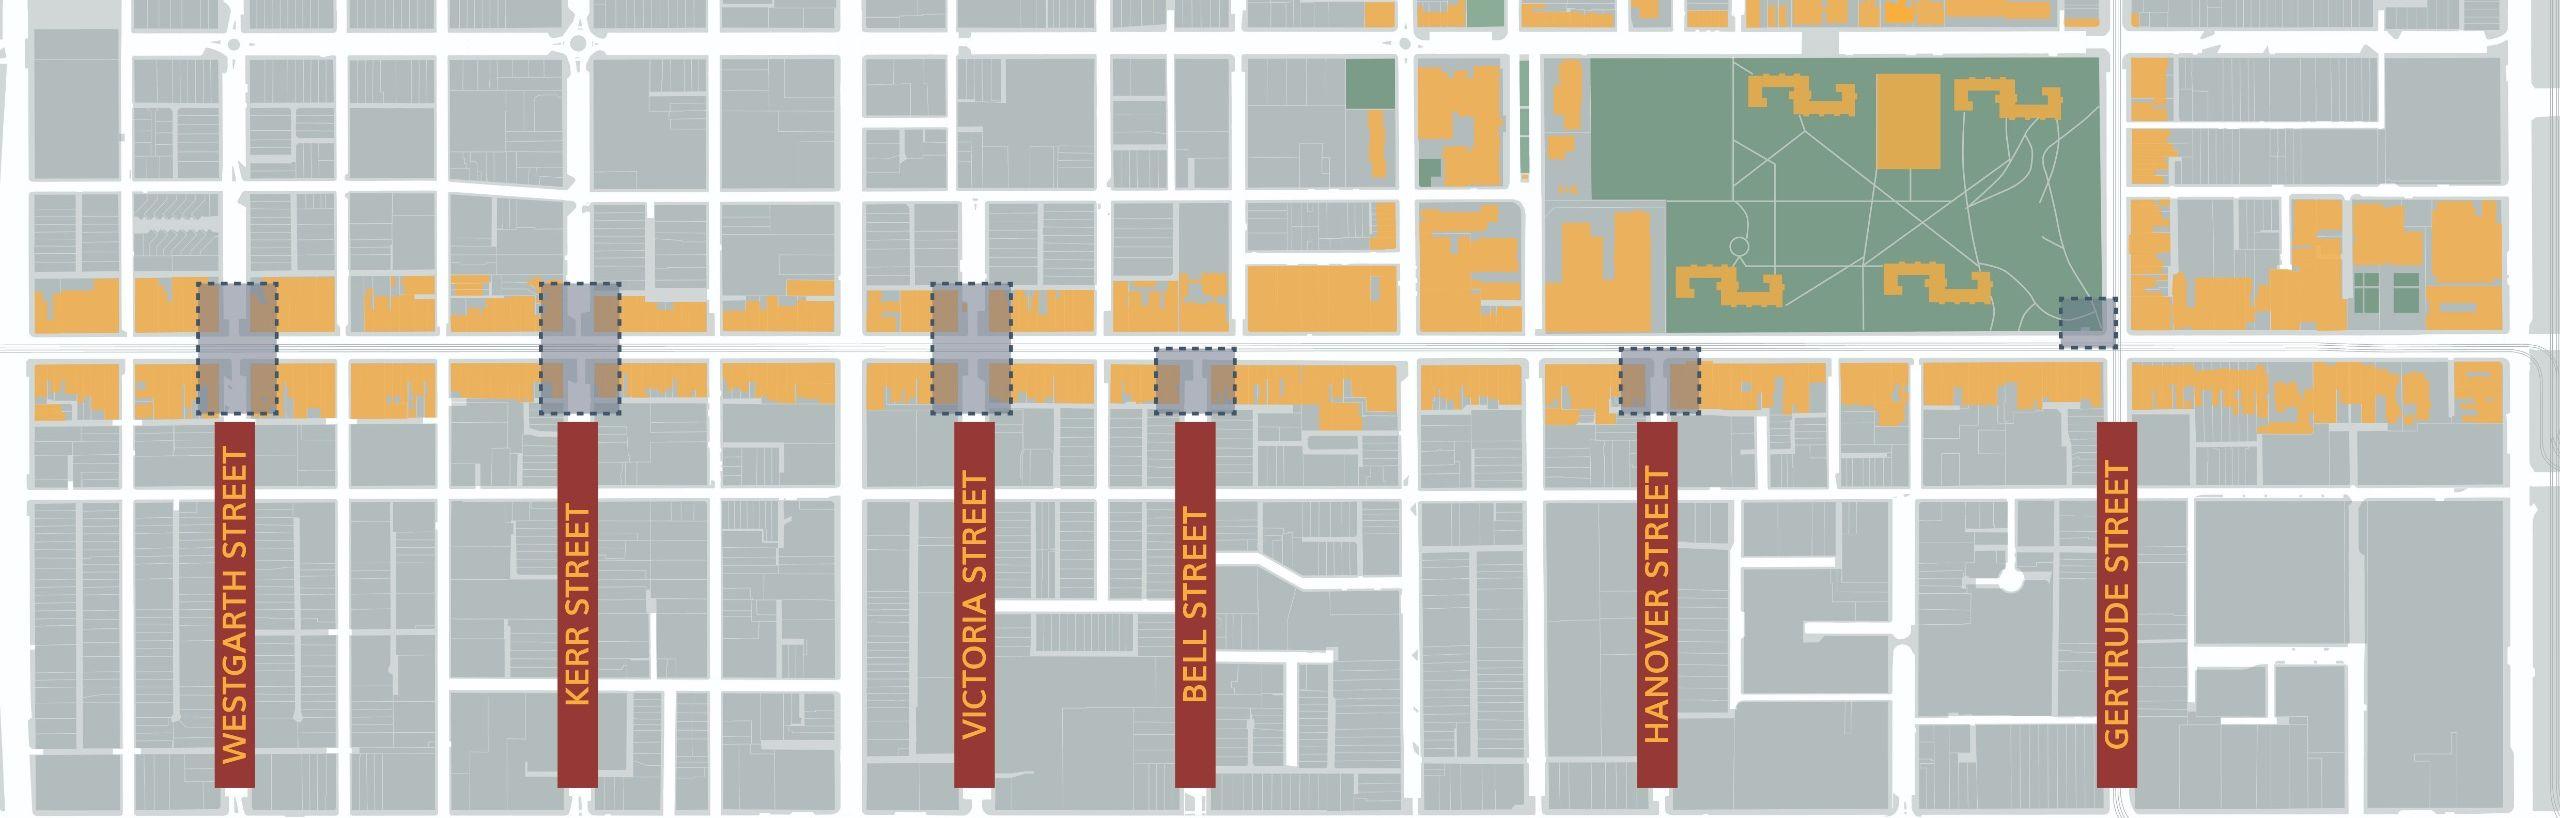 Map of Brunswick Street, showing Westgarth Street, Kerr Street, Victoria Street, Bell Street, Hanover Street and Gertrude Street